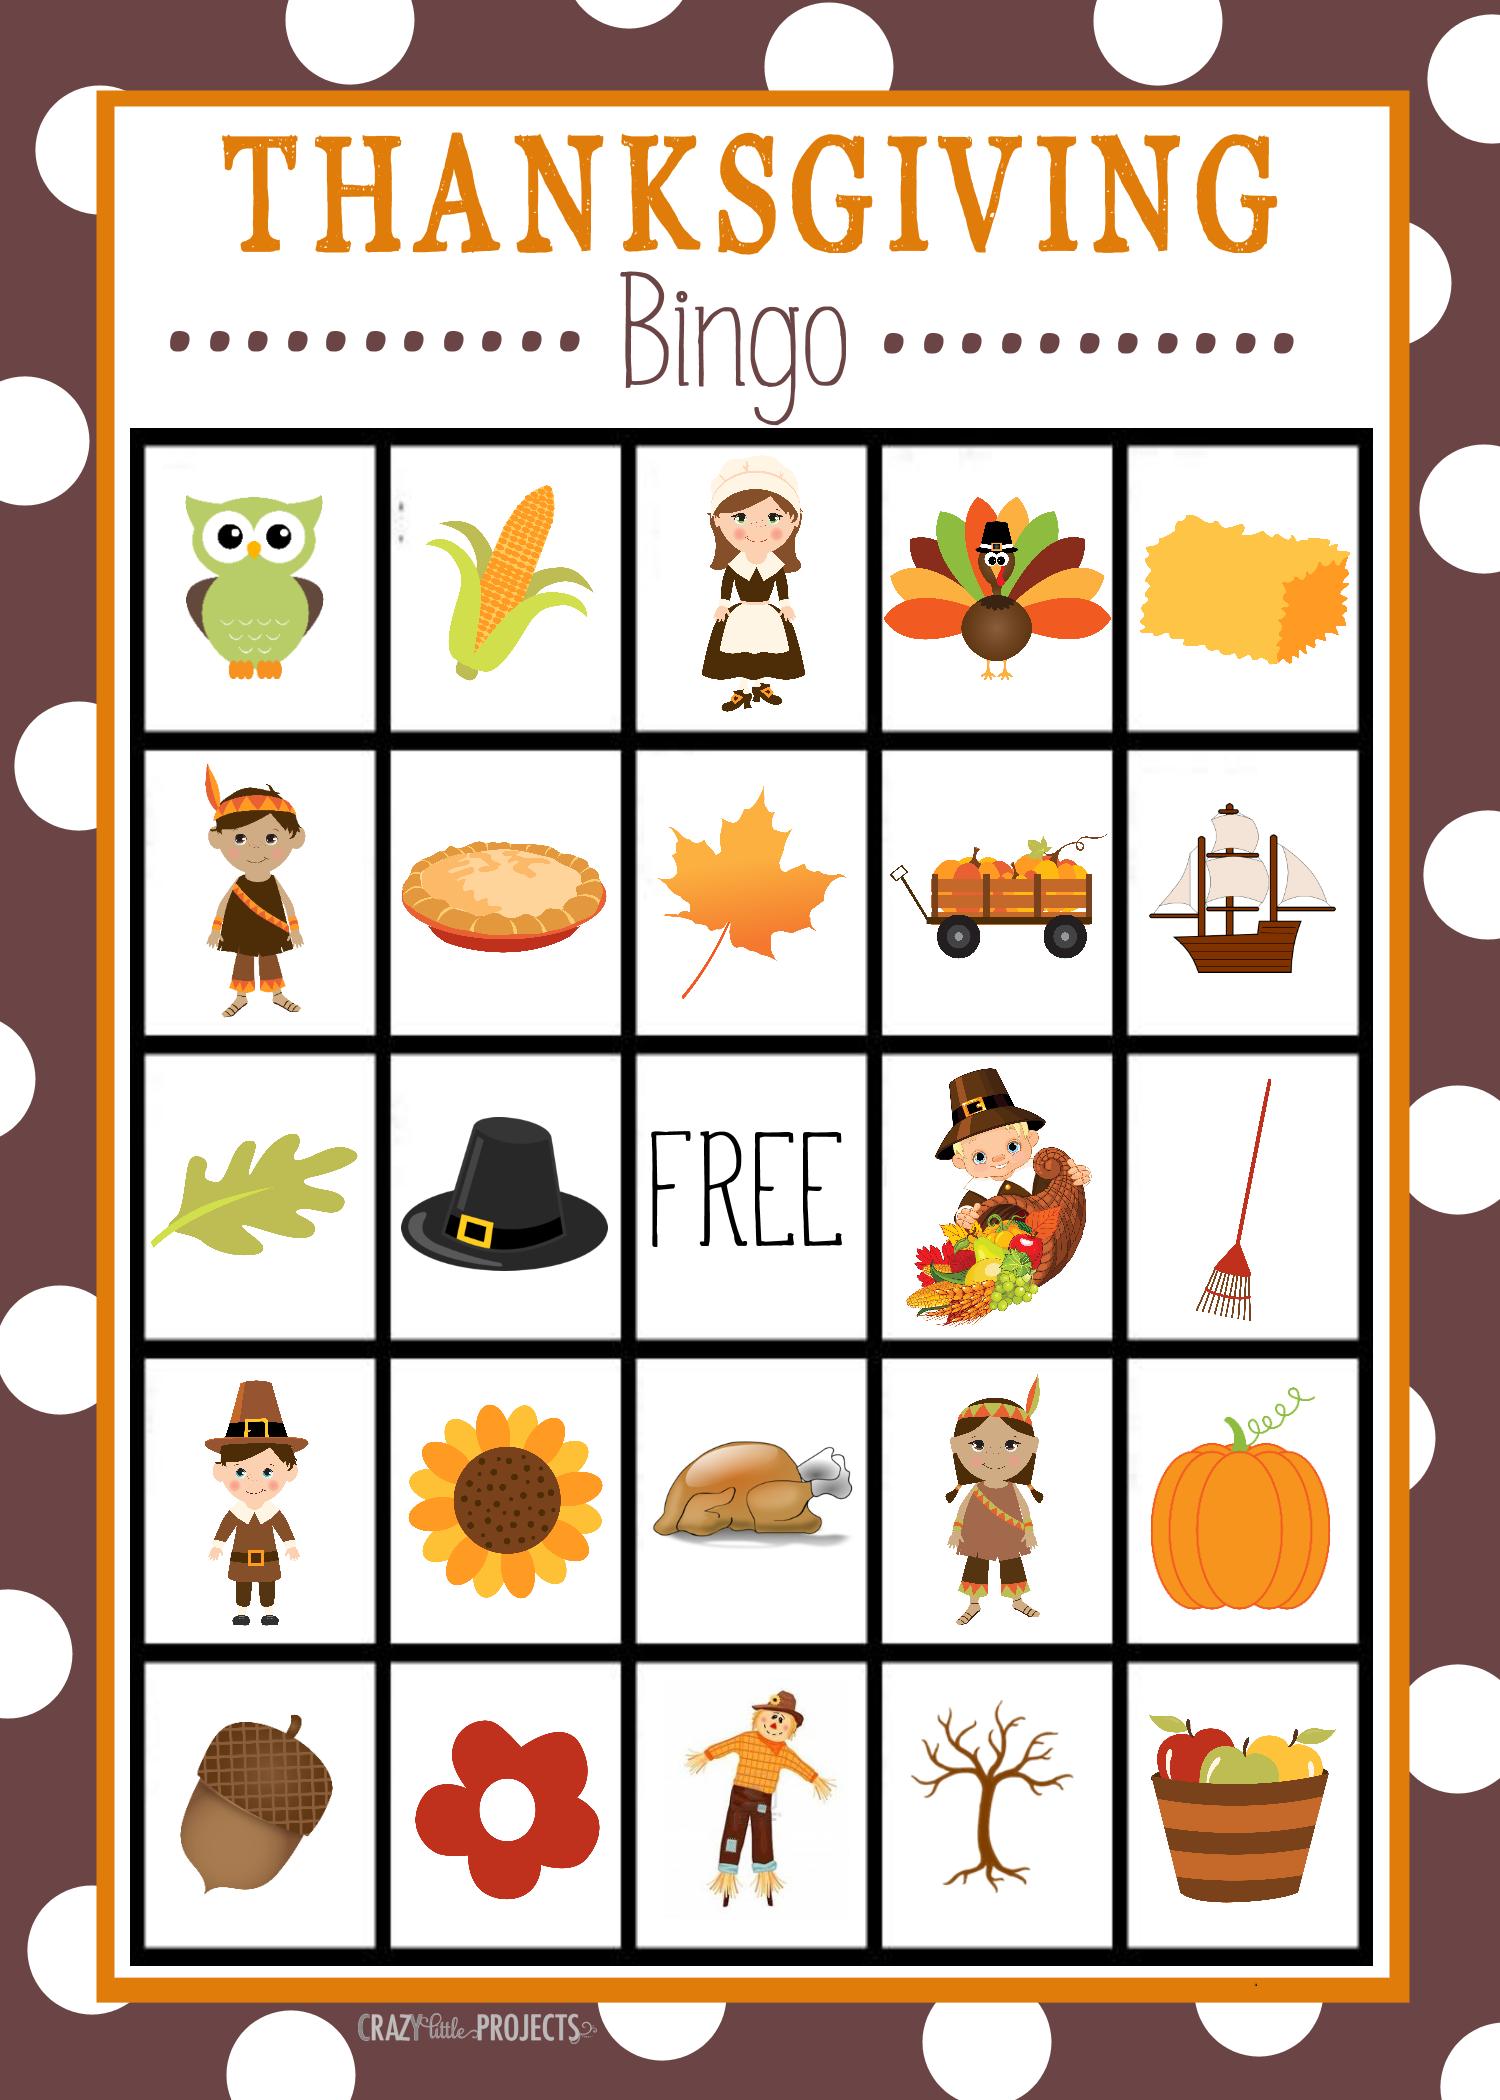 8 Images of Printable Thanksgiving Bingo Game